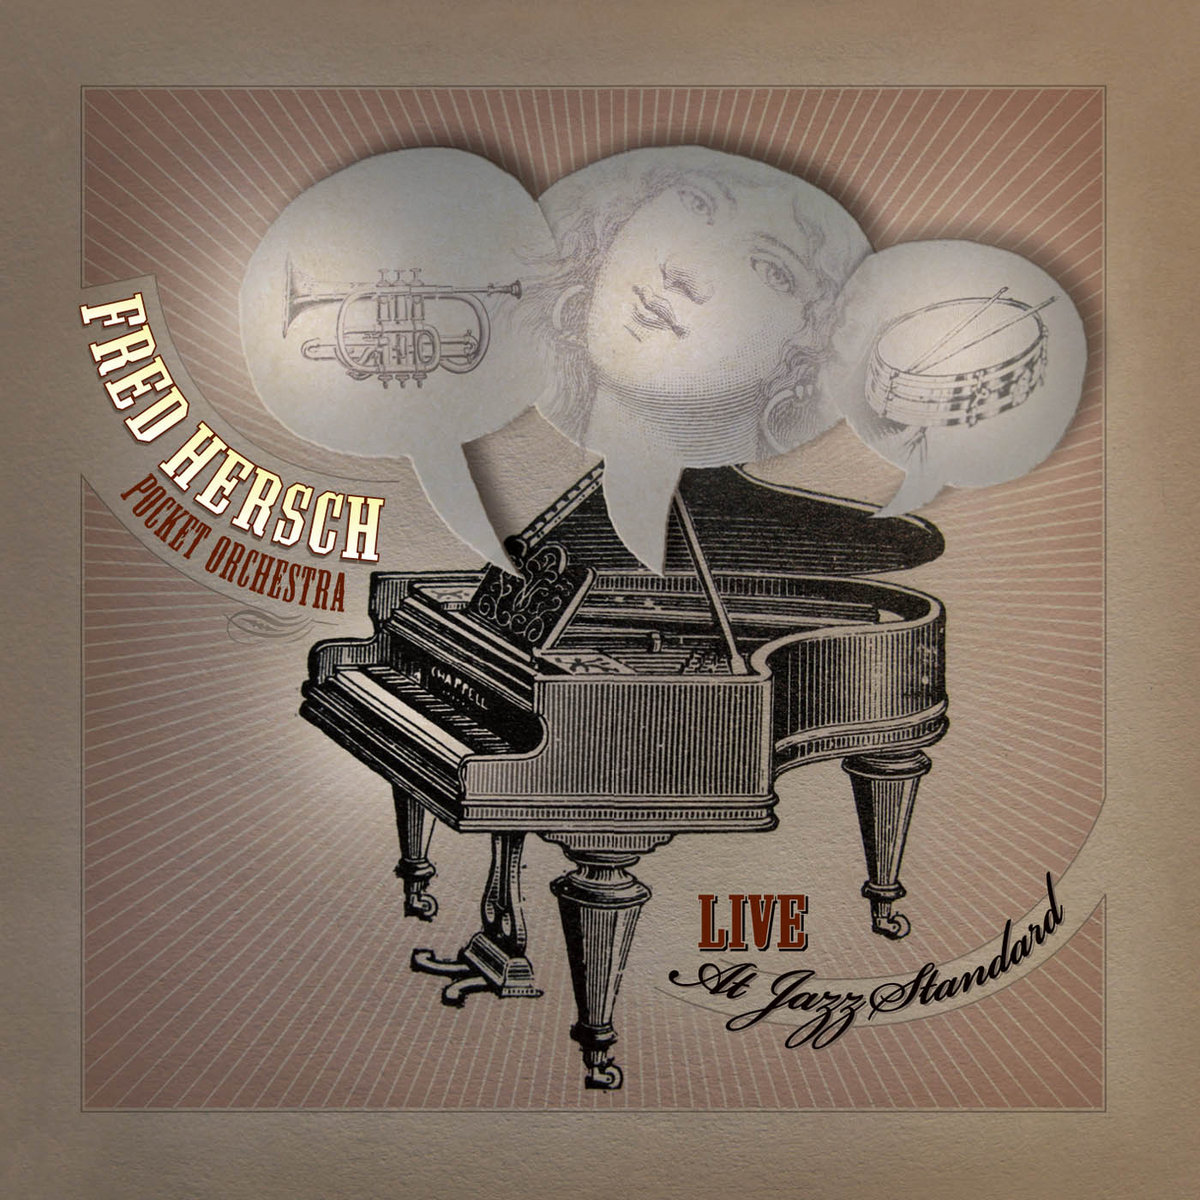 Live at jazz standard sunnyside records live at jazz standard stopboris Gallery